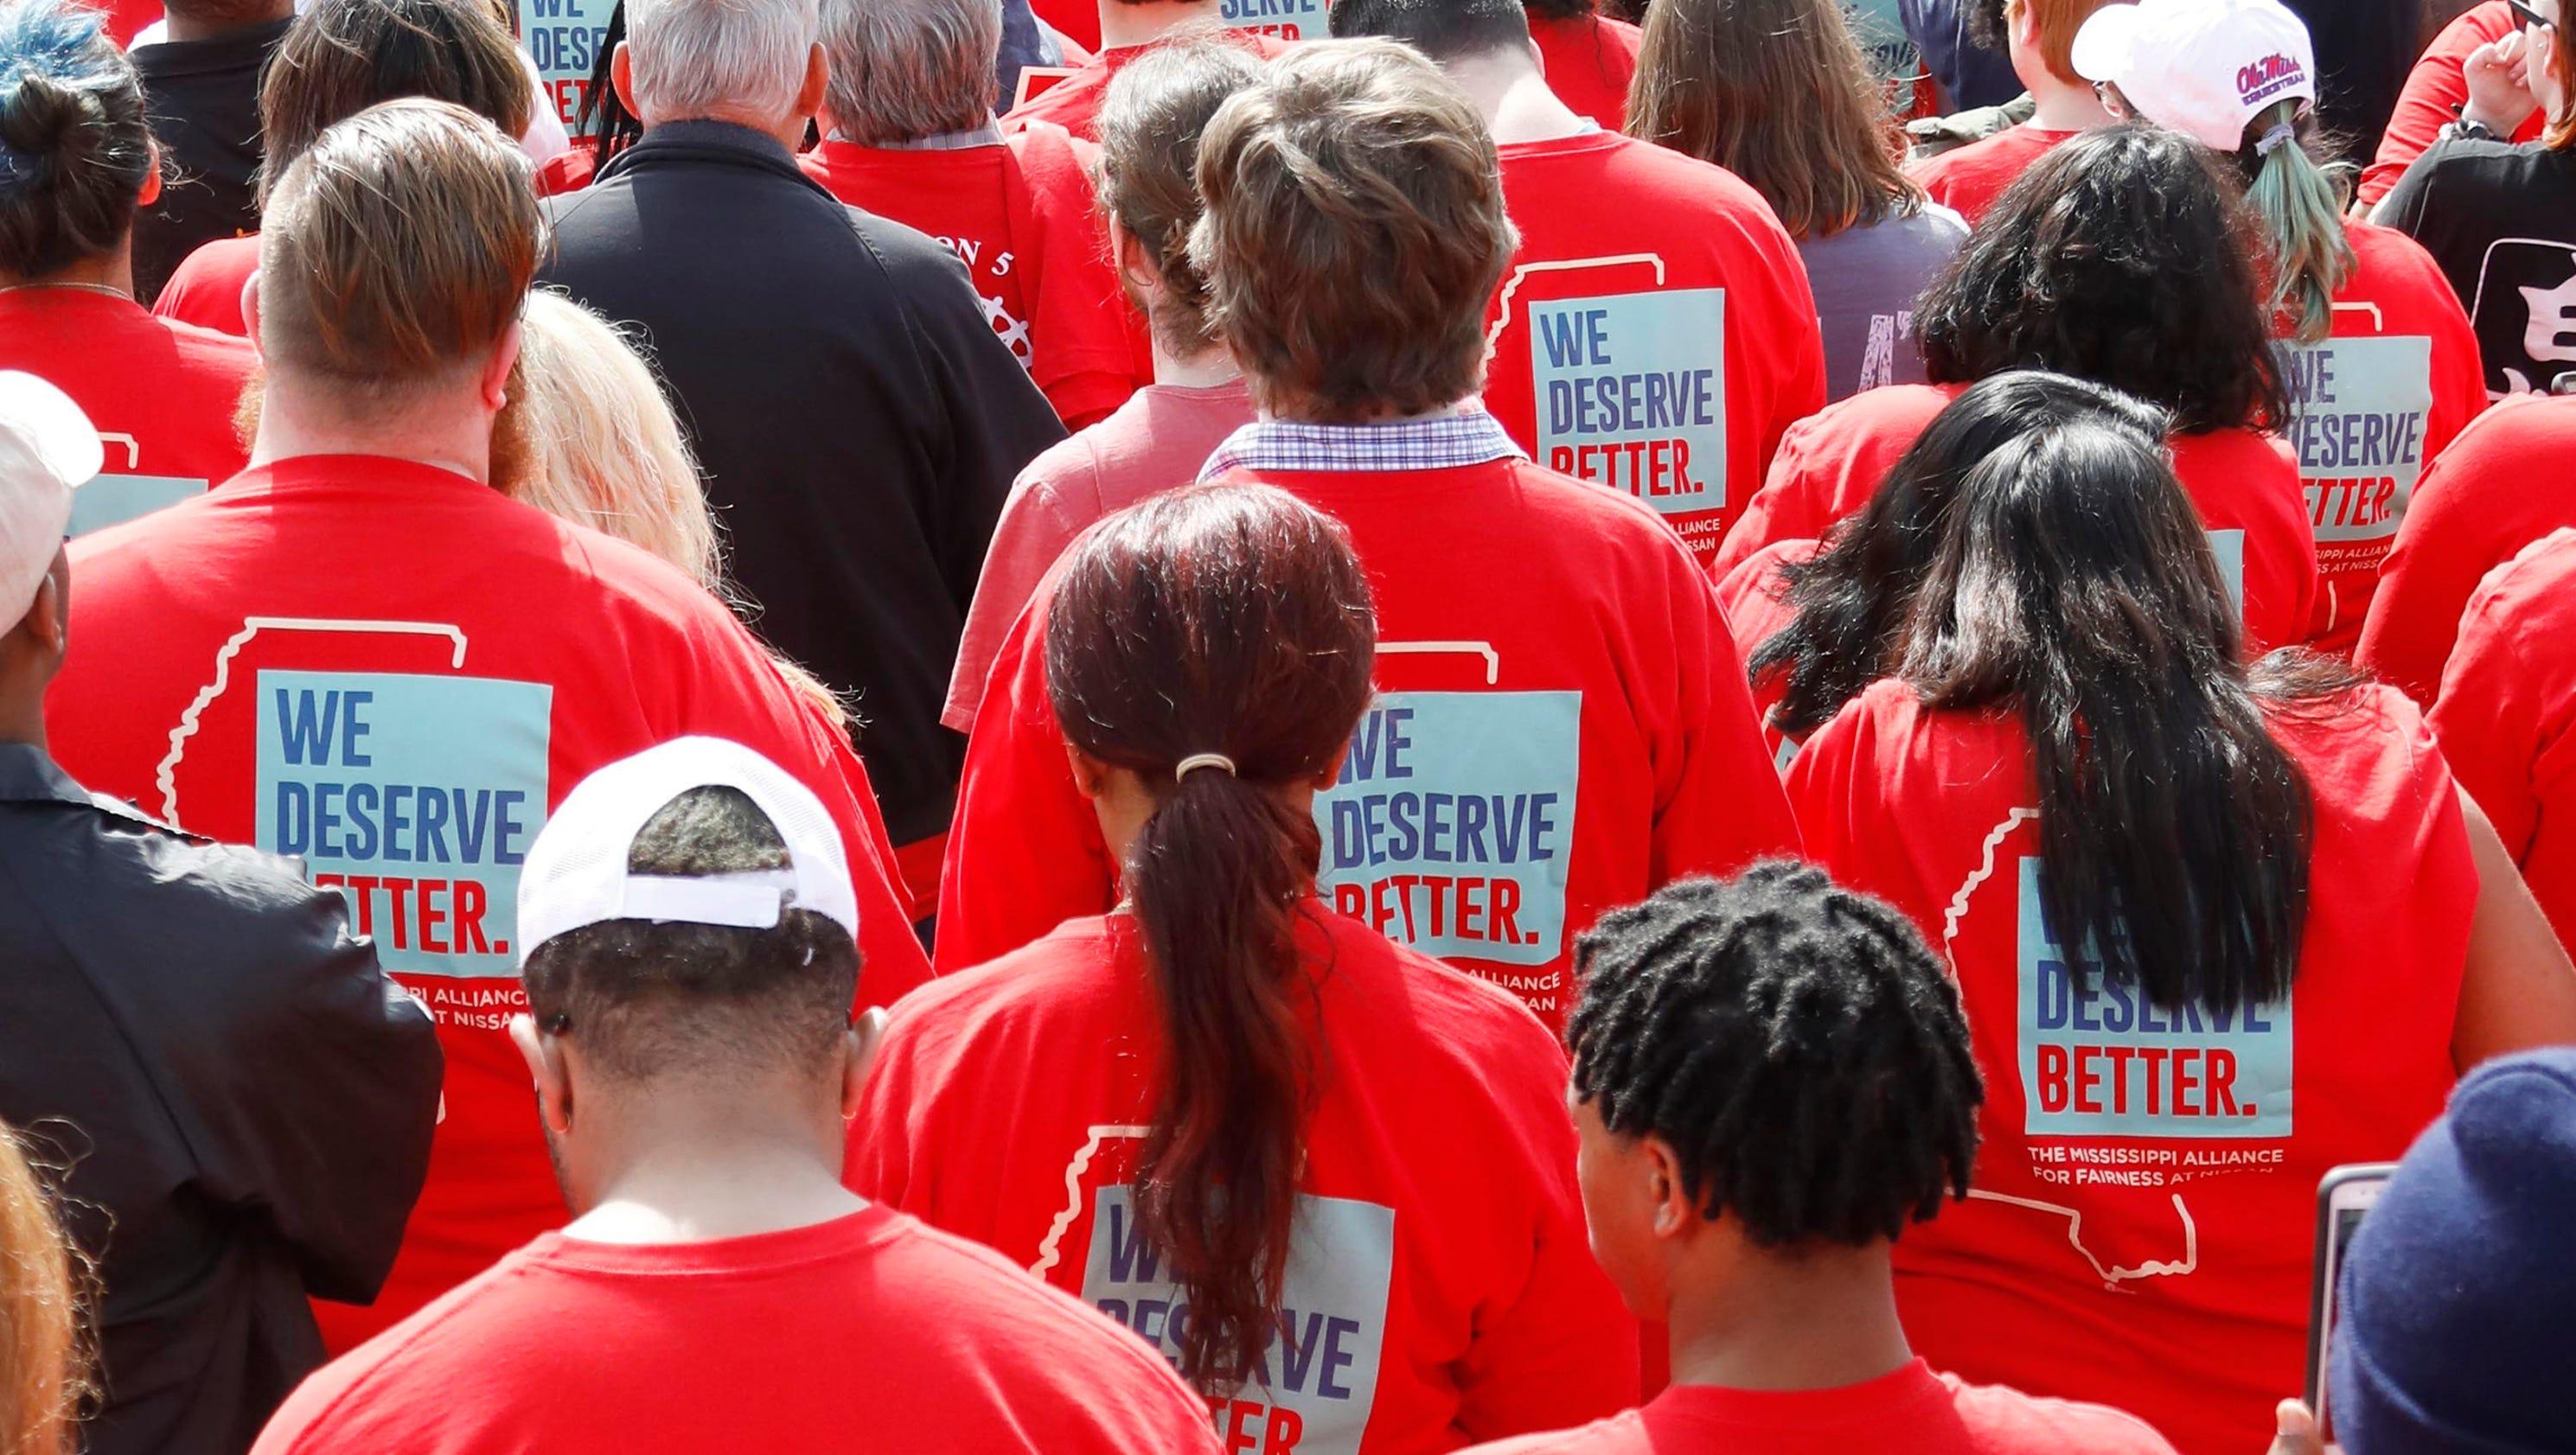 Nissan Union City >> Aug. 3, 4 set for vote to decide union at Canton Nissan plant